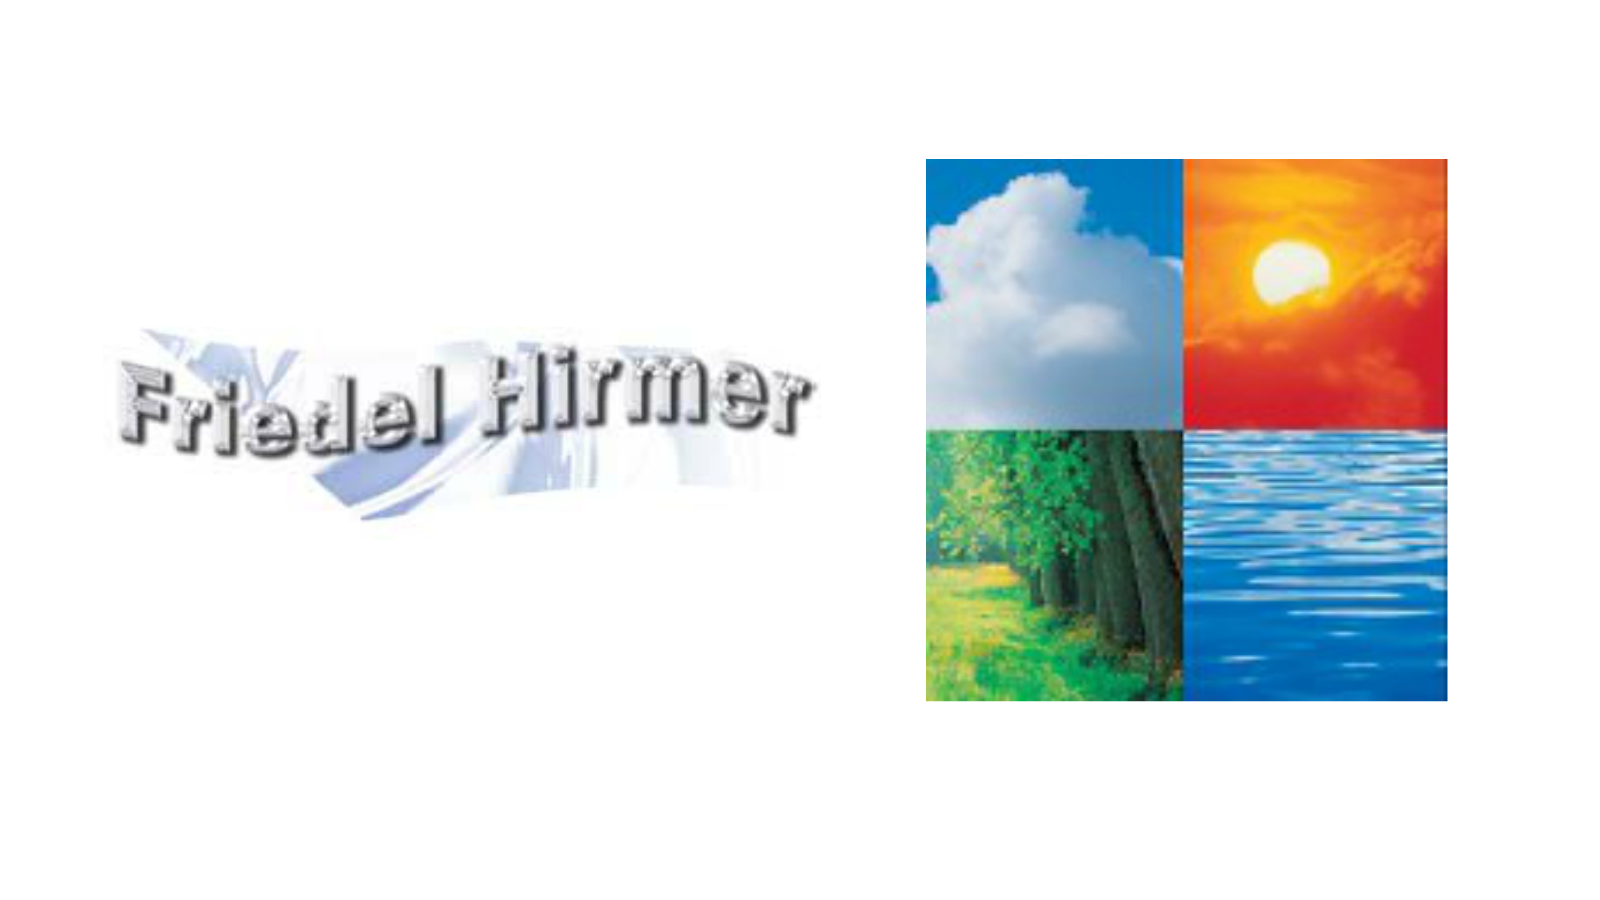 Friedel Hirmer Heizung-Sanitär-Lüftung